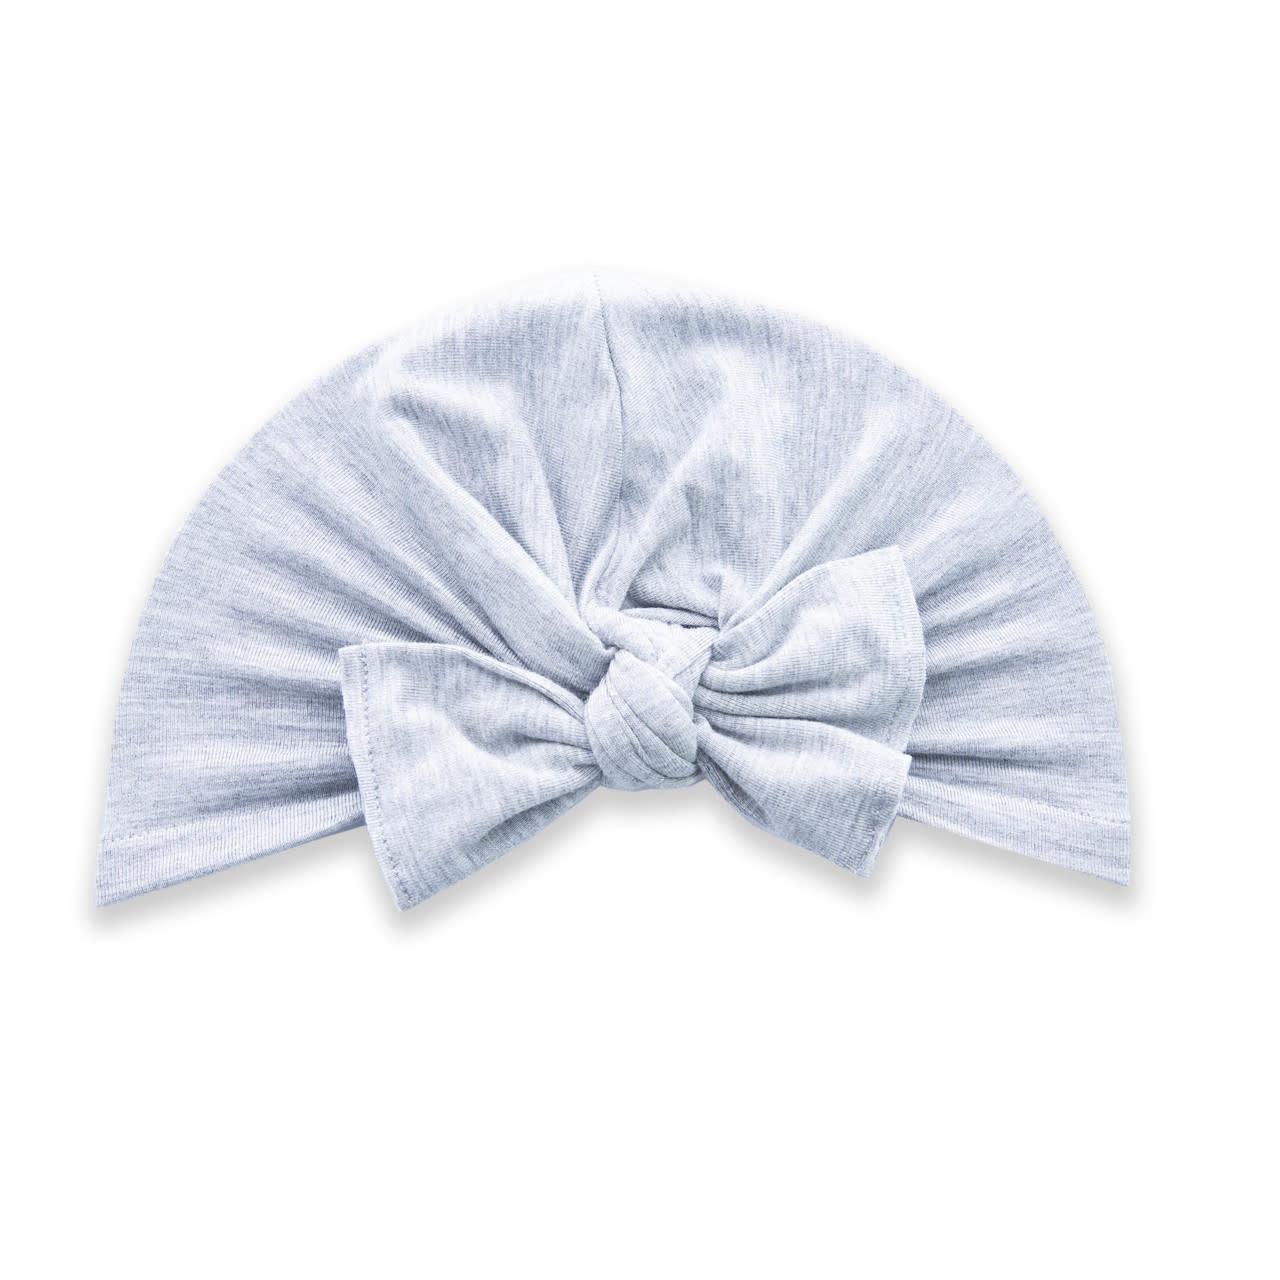 Baby Bling Bows Knot Turban : Grey